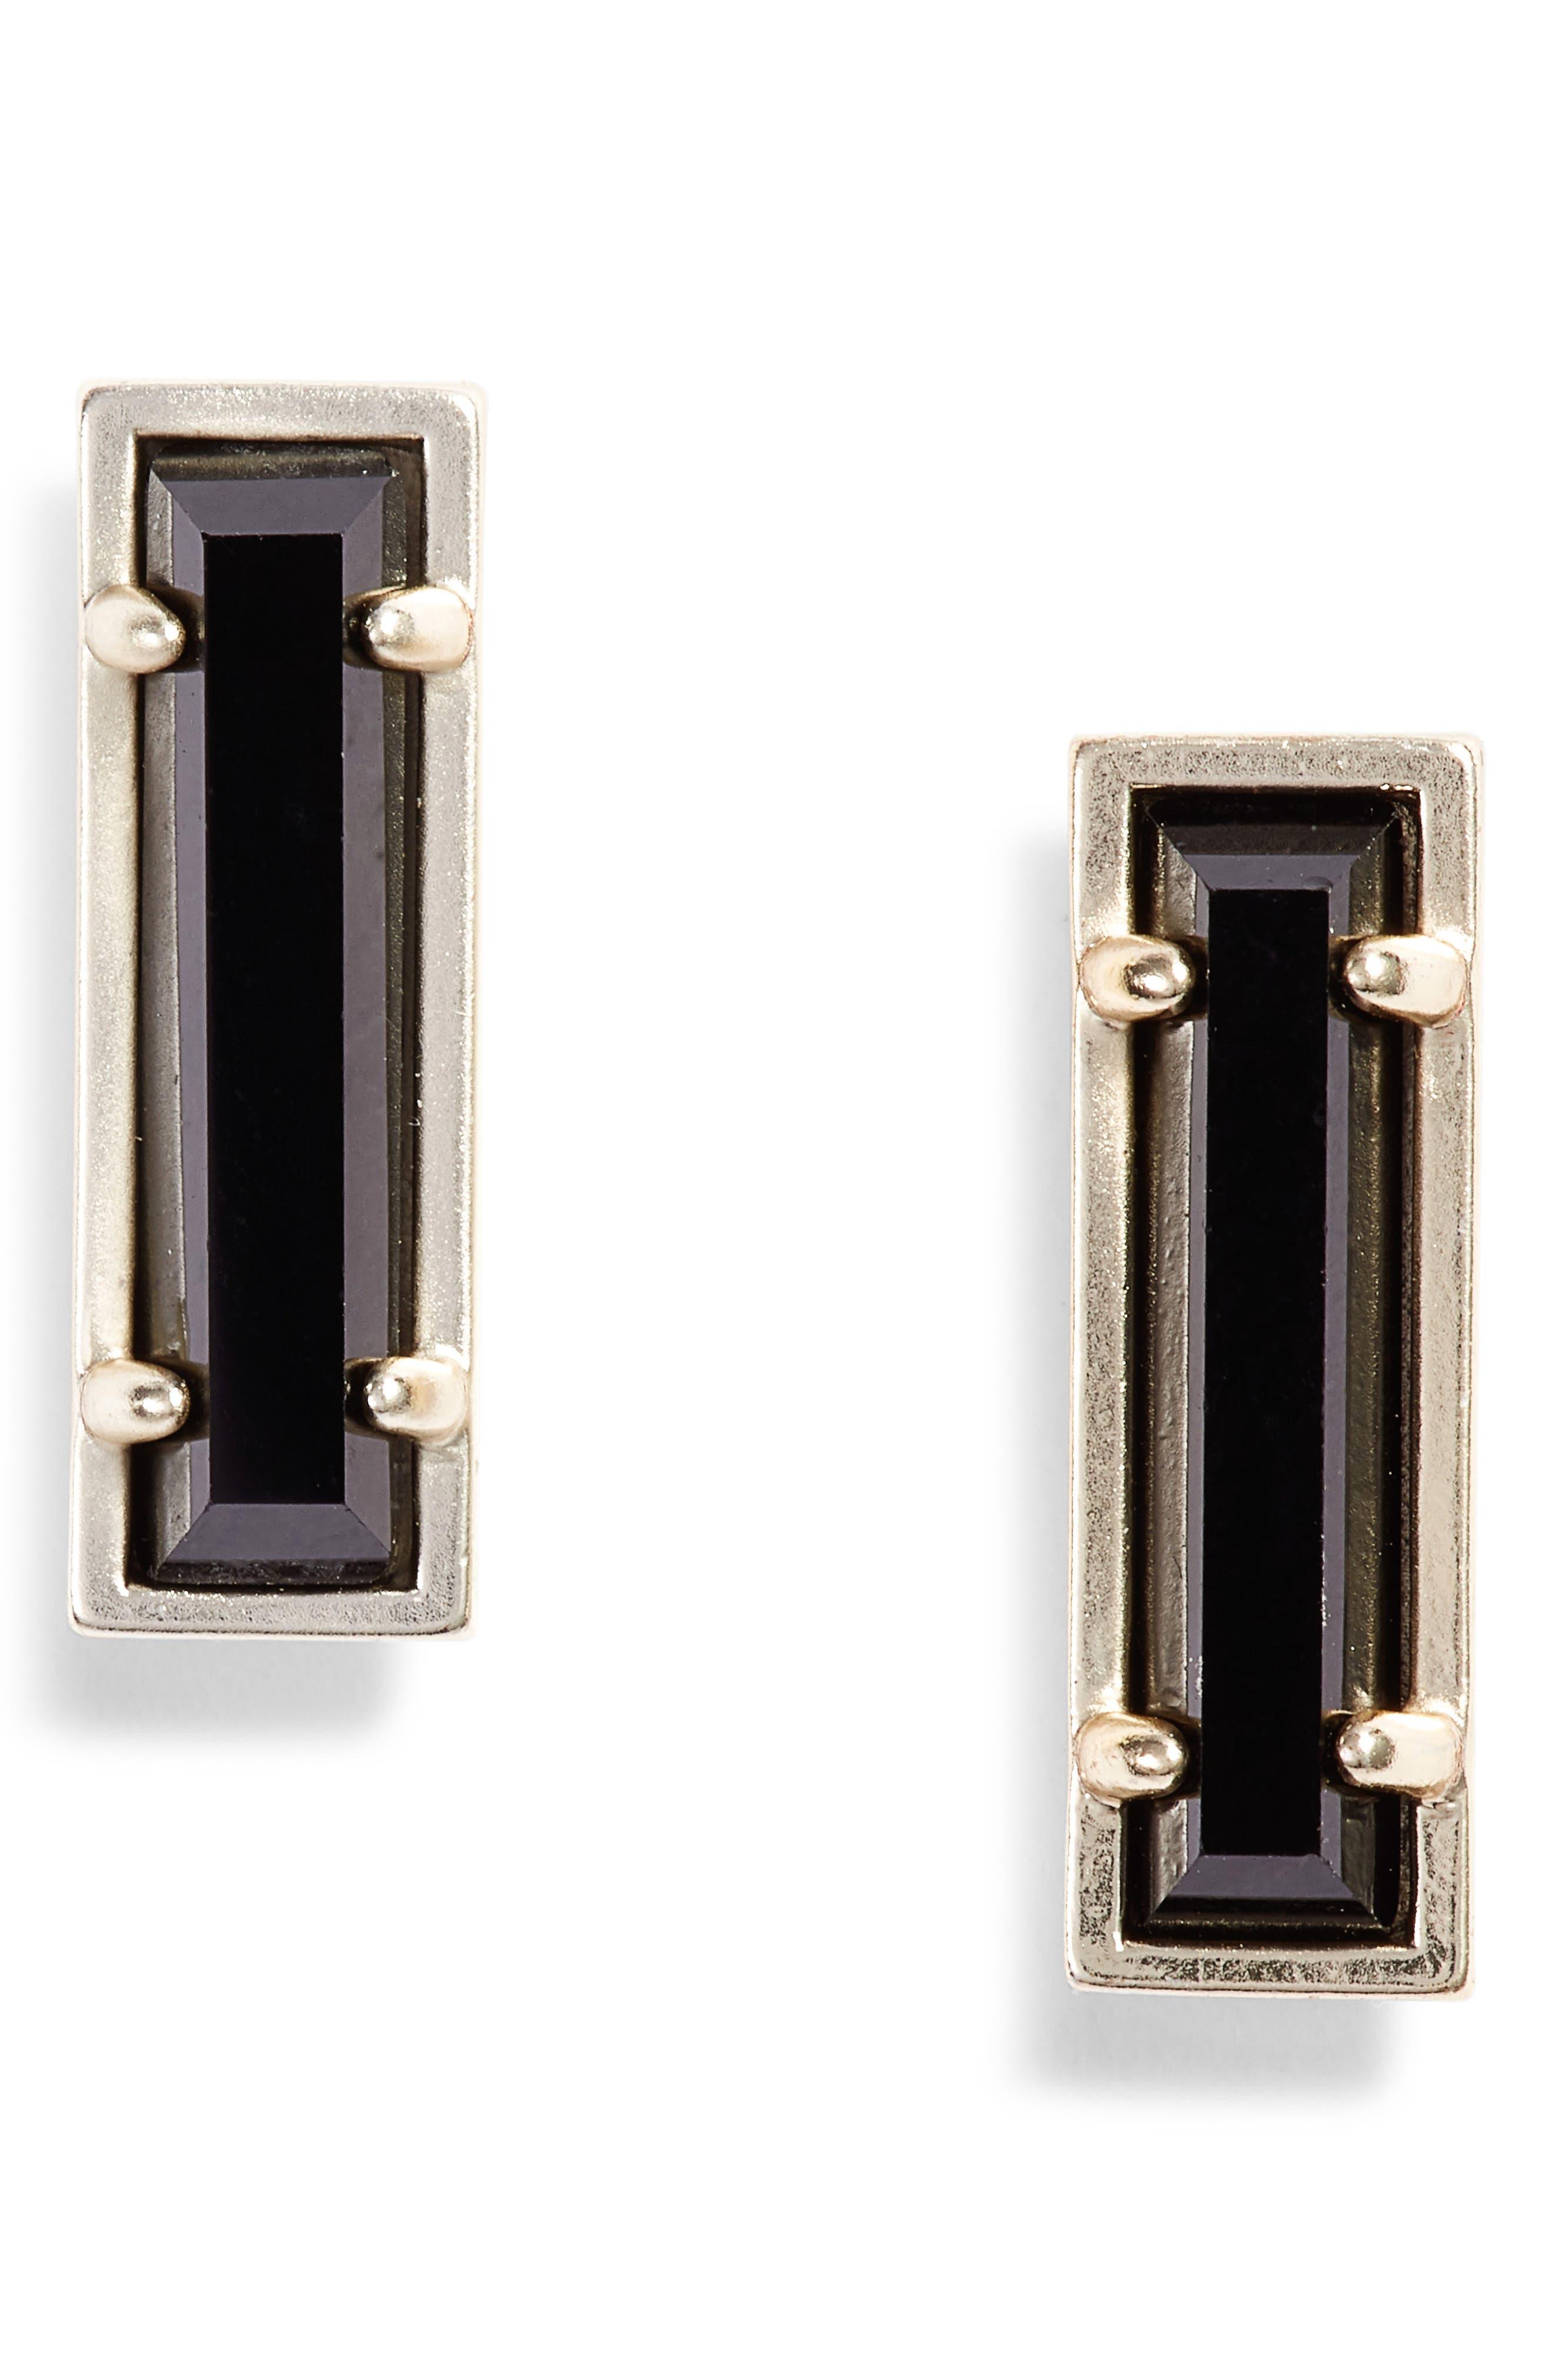 KENDRA SCOTT, Lady Stud Earrings, Main thumbnail 1, color, 002